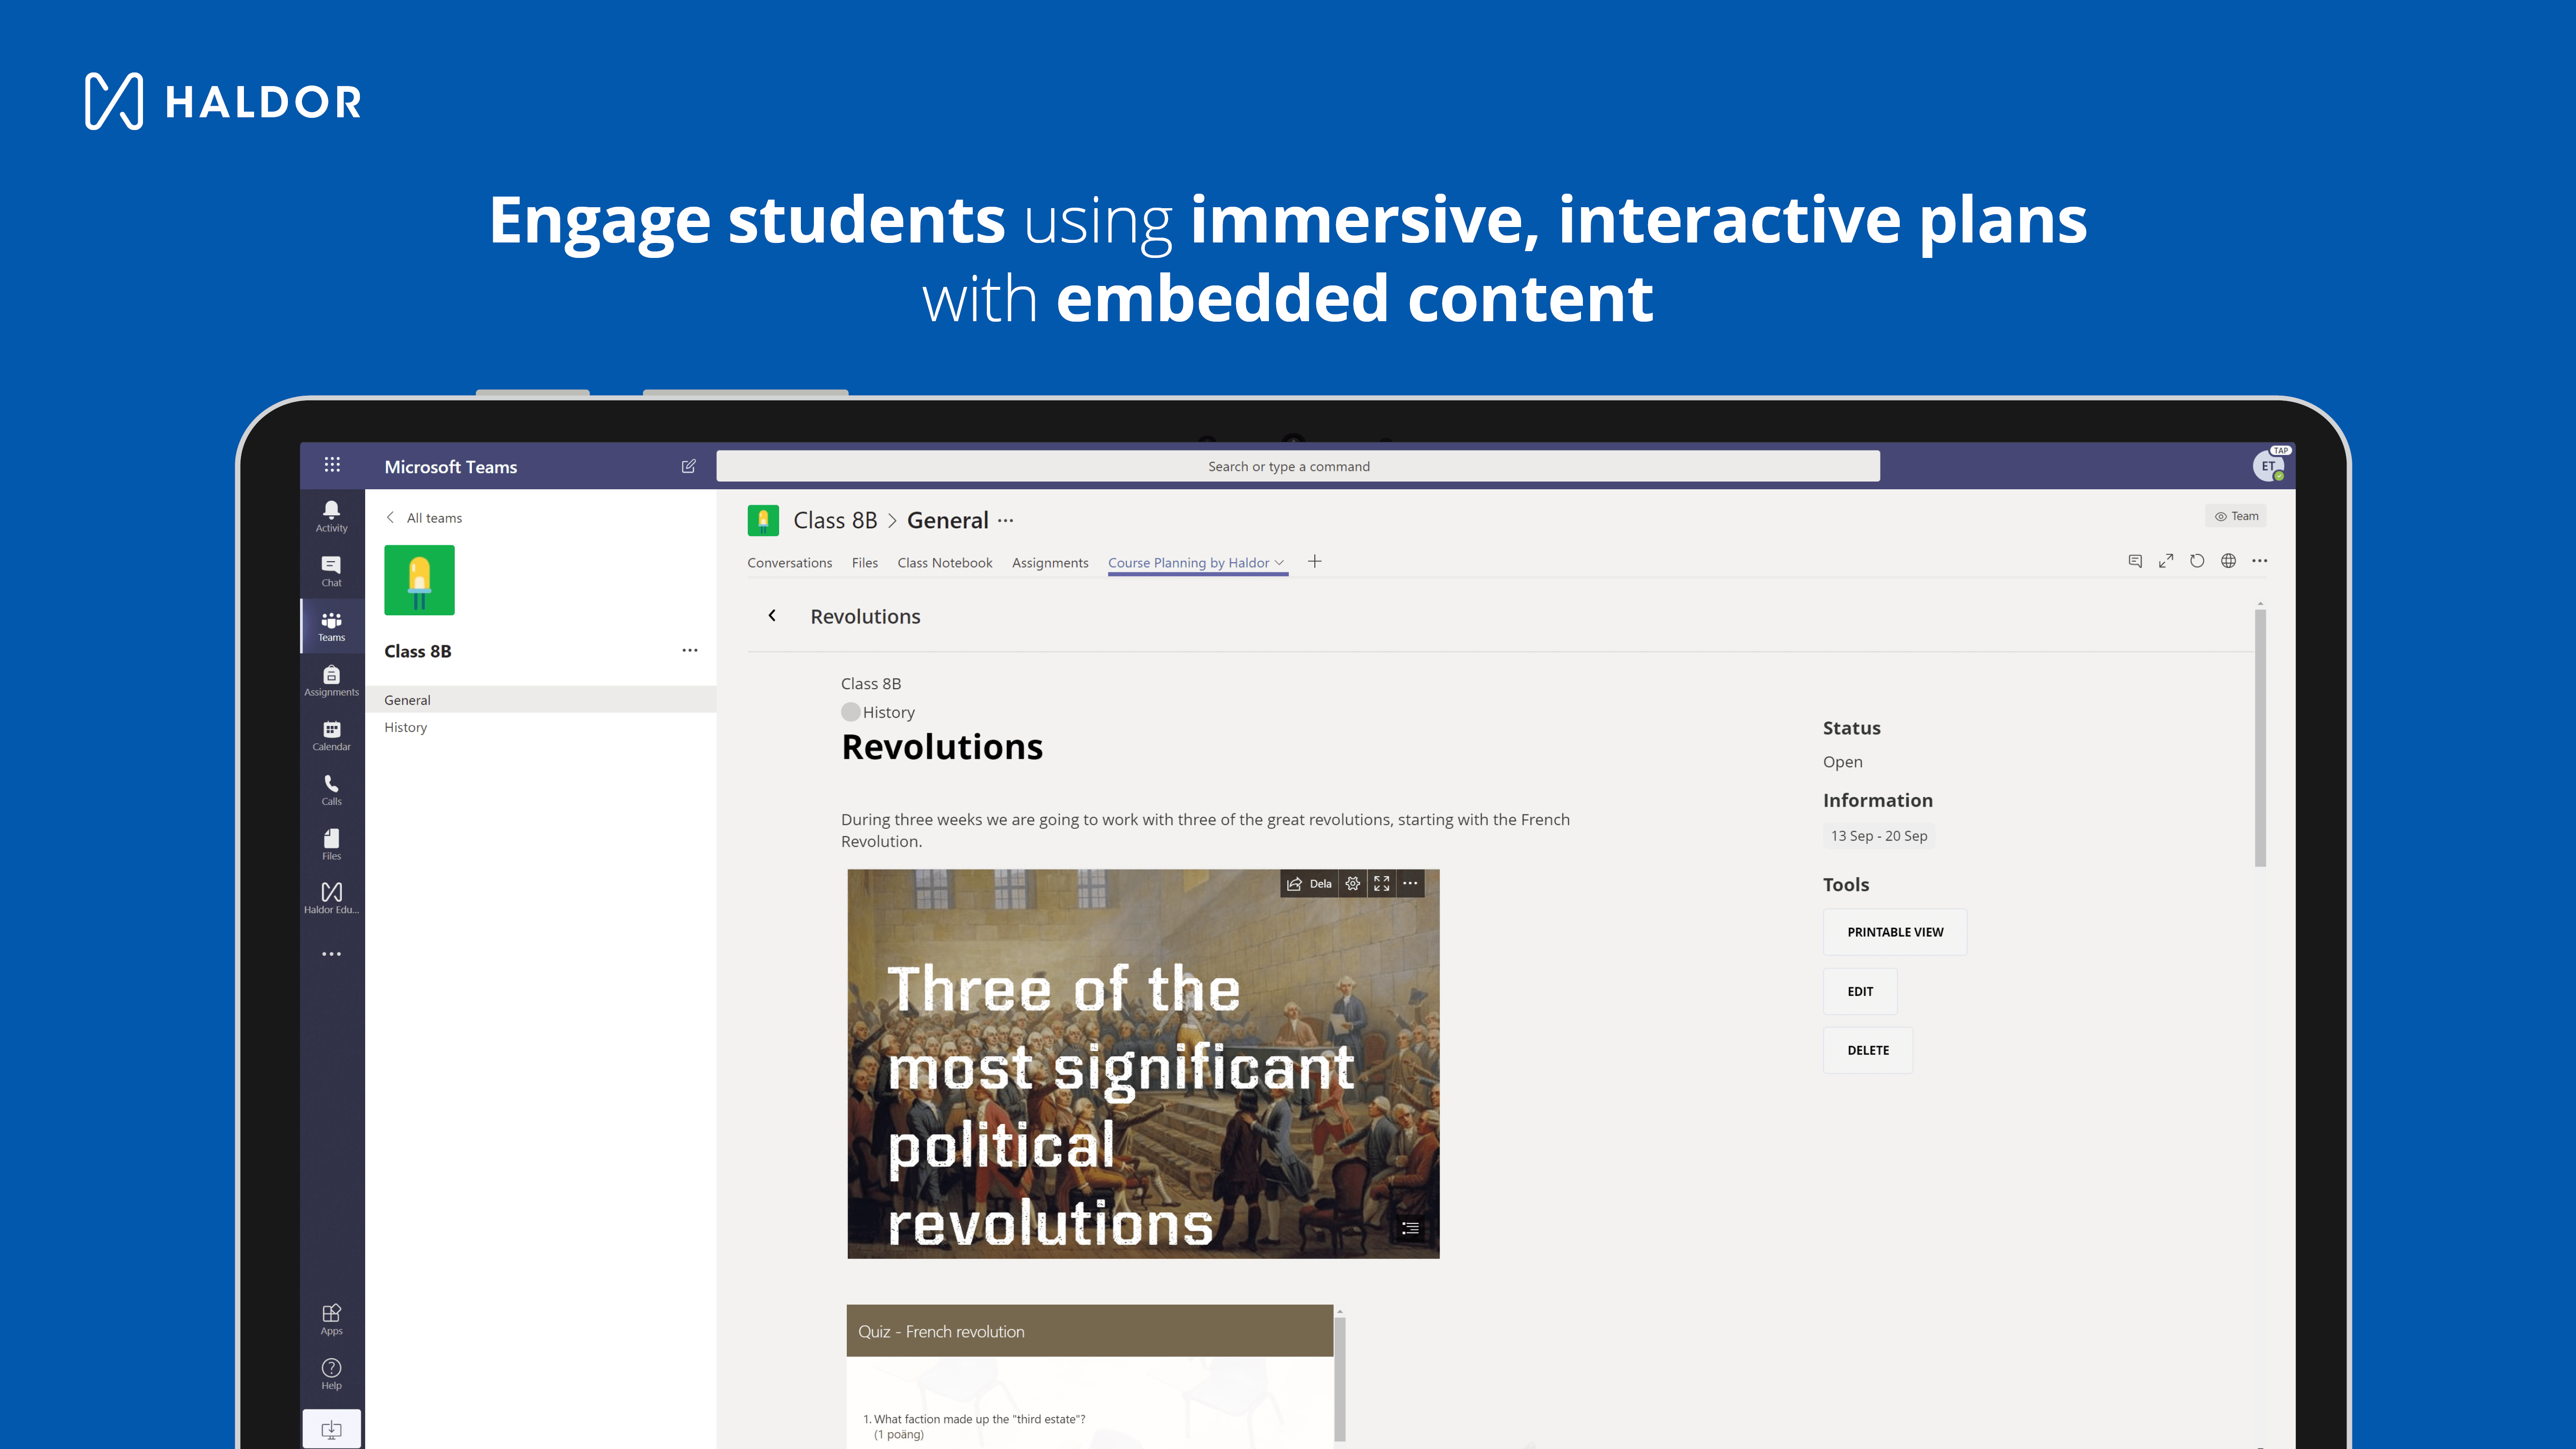 Screenshot - Haldor embedded content